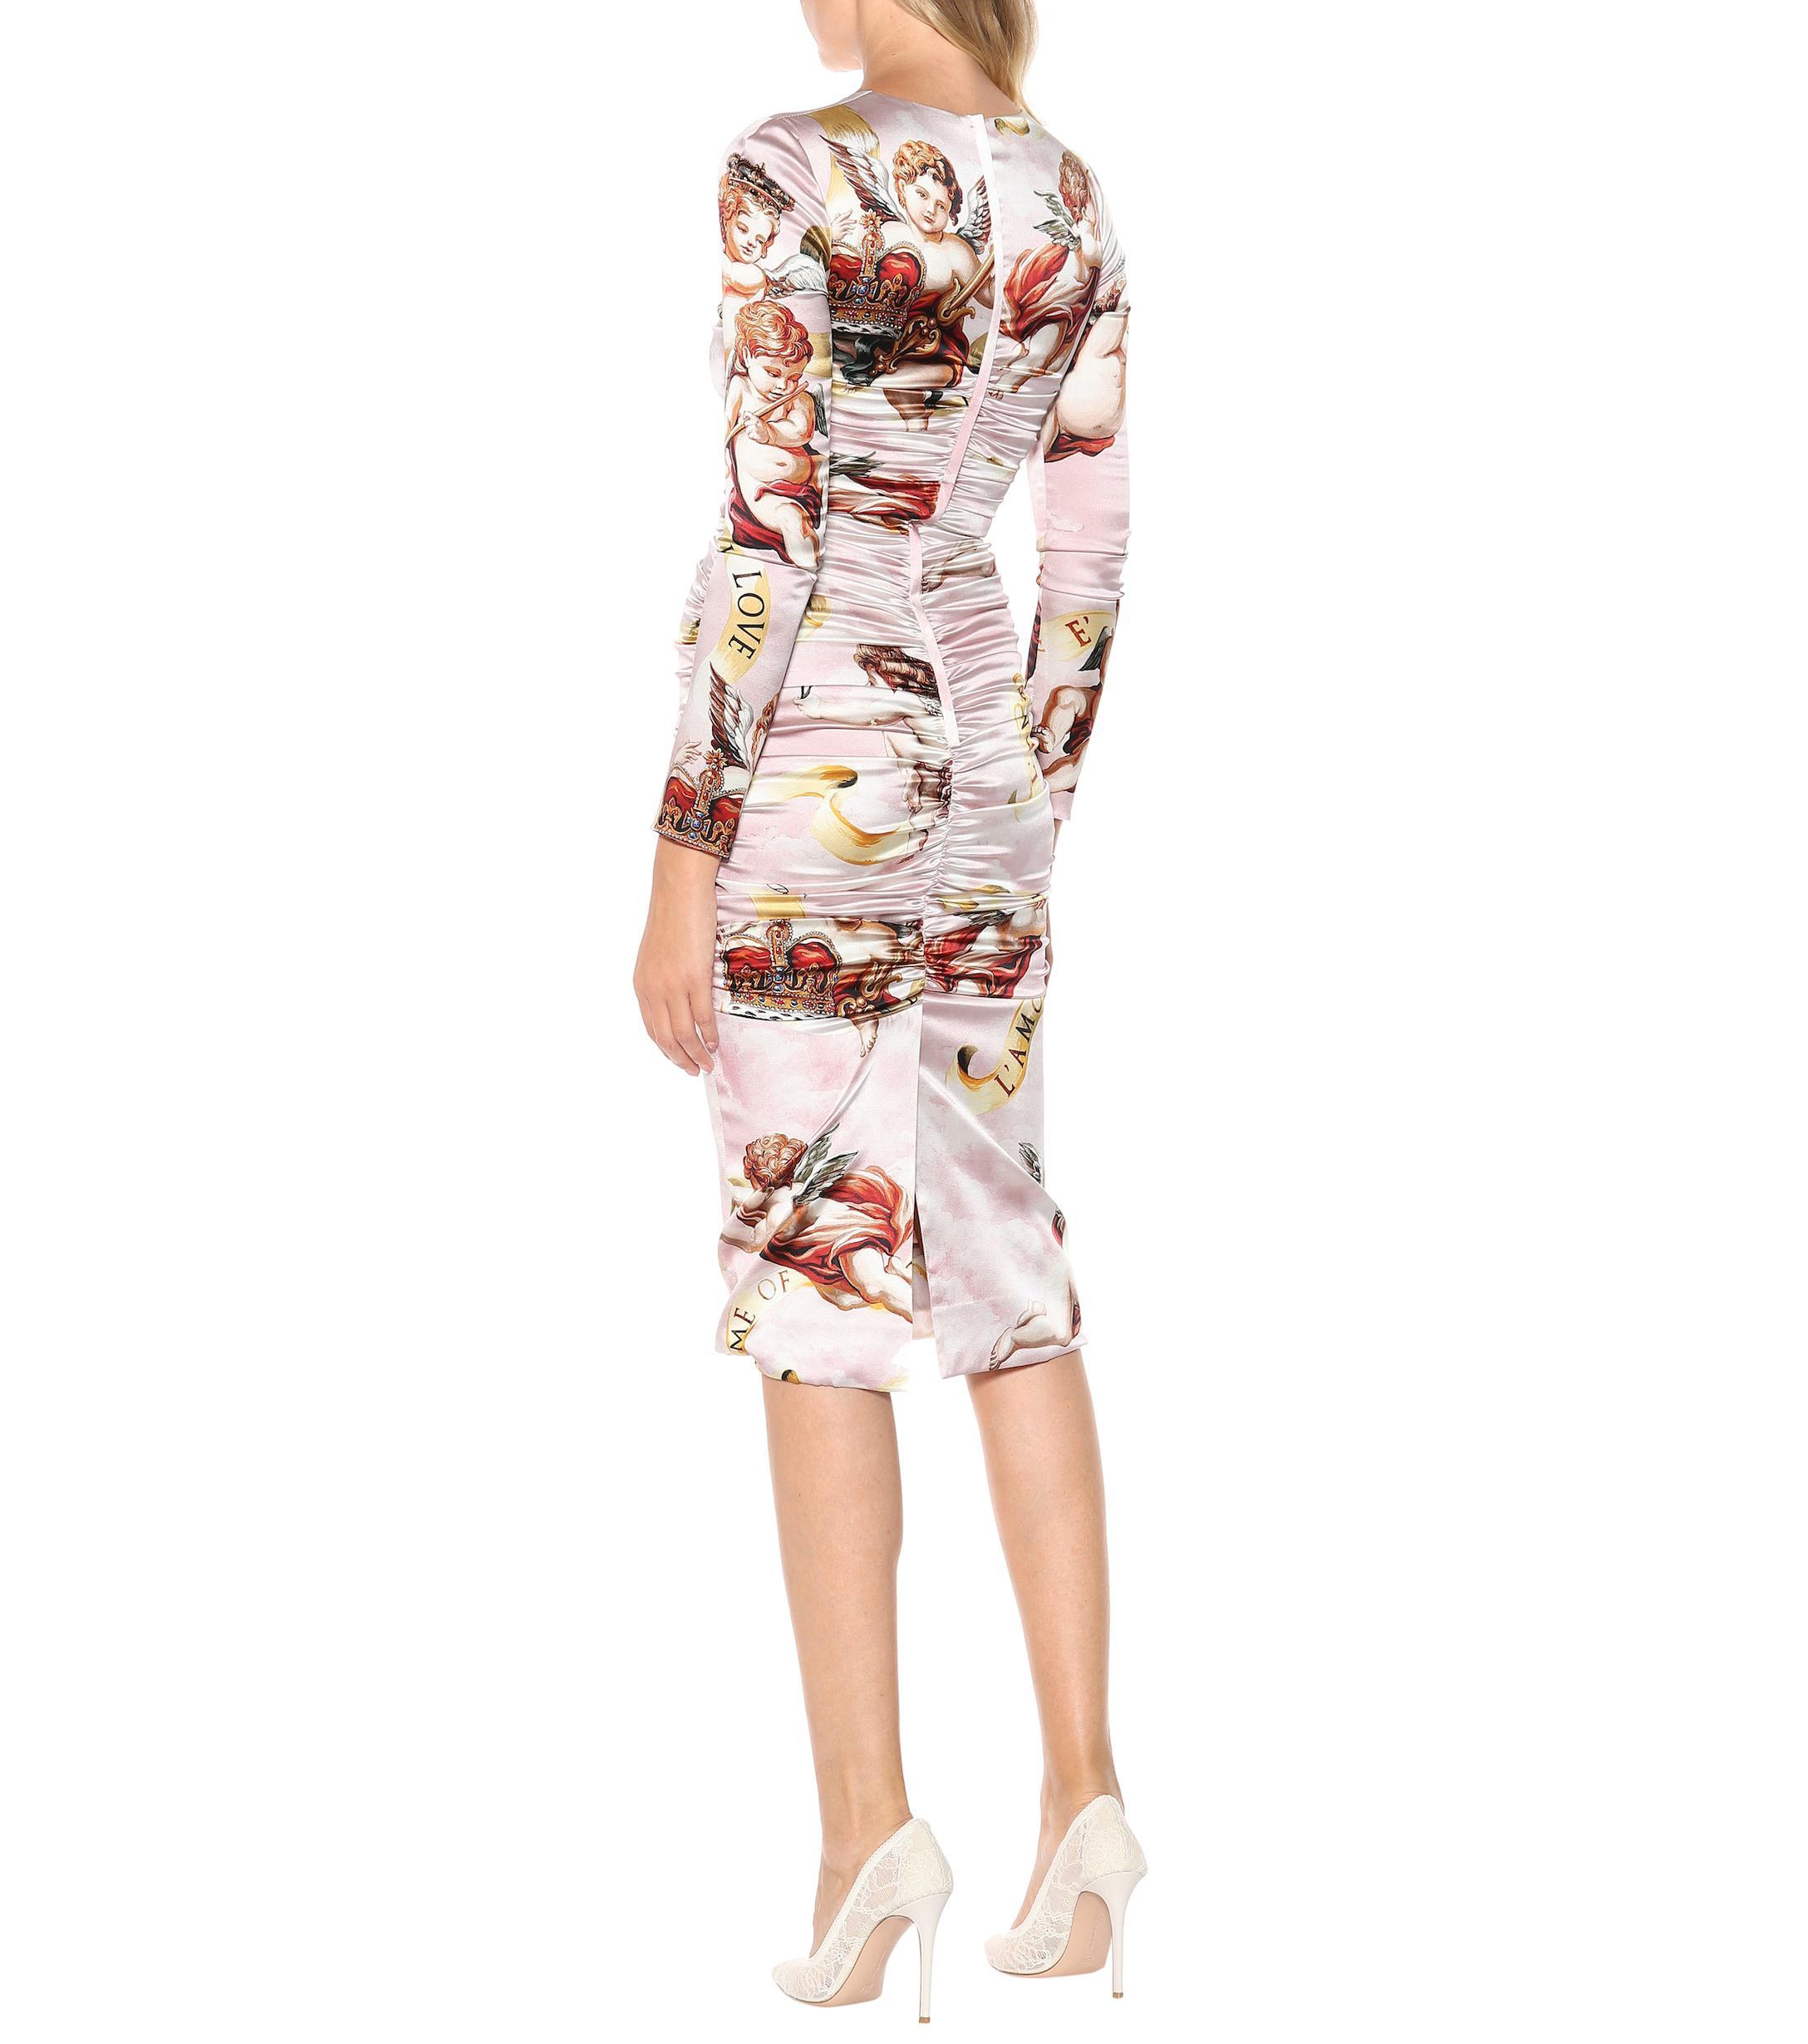 8ee5699434fc Dolce & Gabbana Cherub Silk-satin Dress in Pink - Lyst